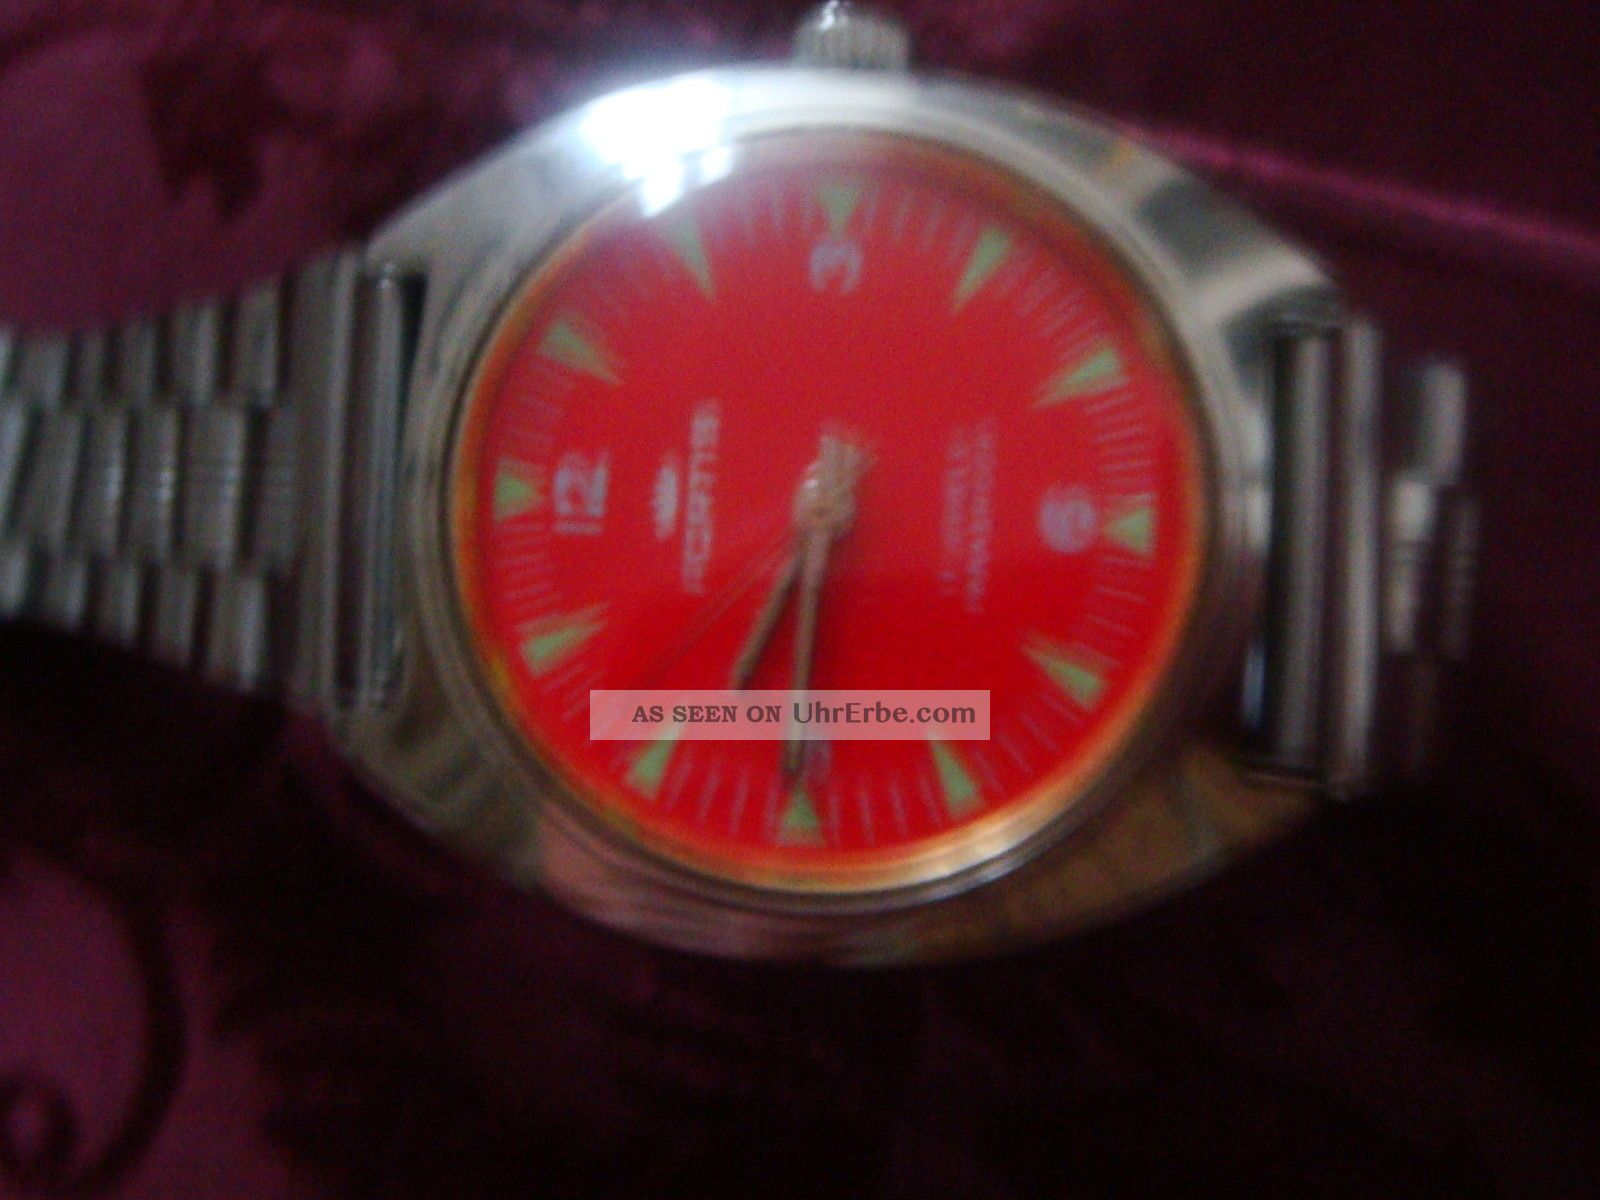 Fortis Handaufzug 17 Jewels Rotes Ziffeernblatt 36 Mm Armbanduhren Bild